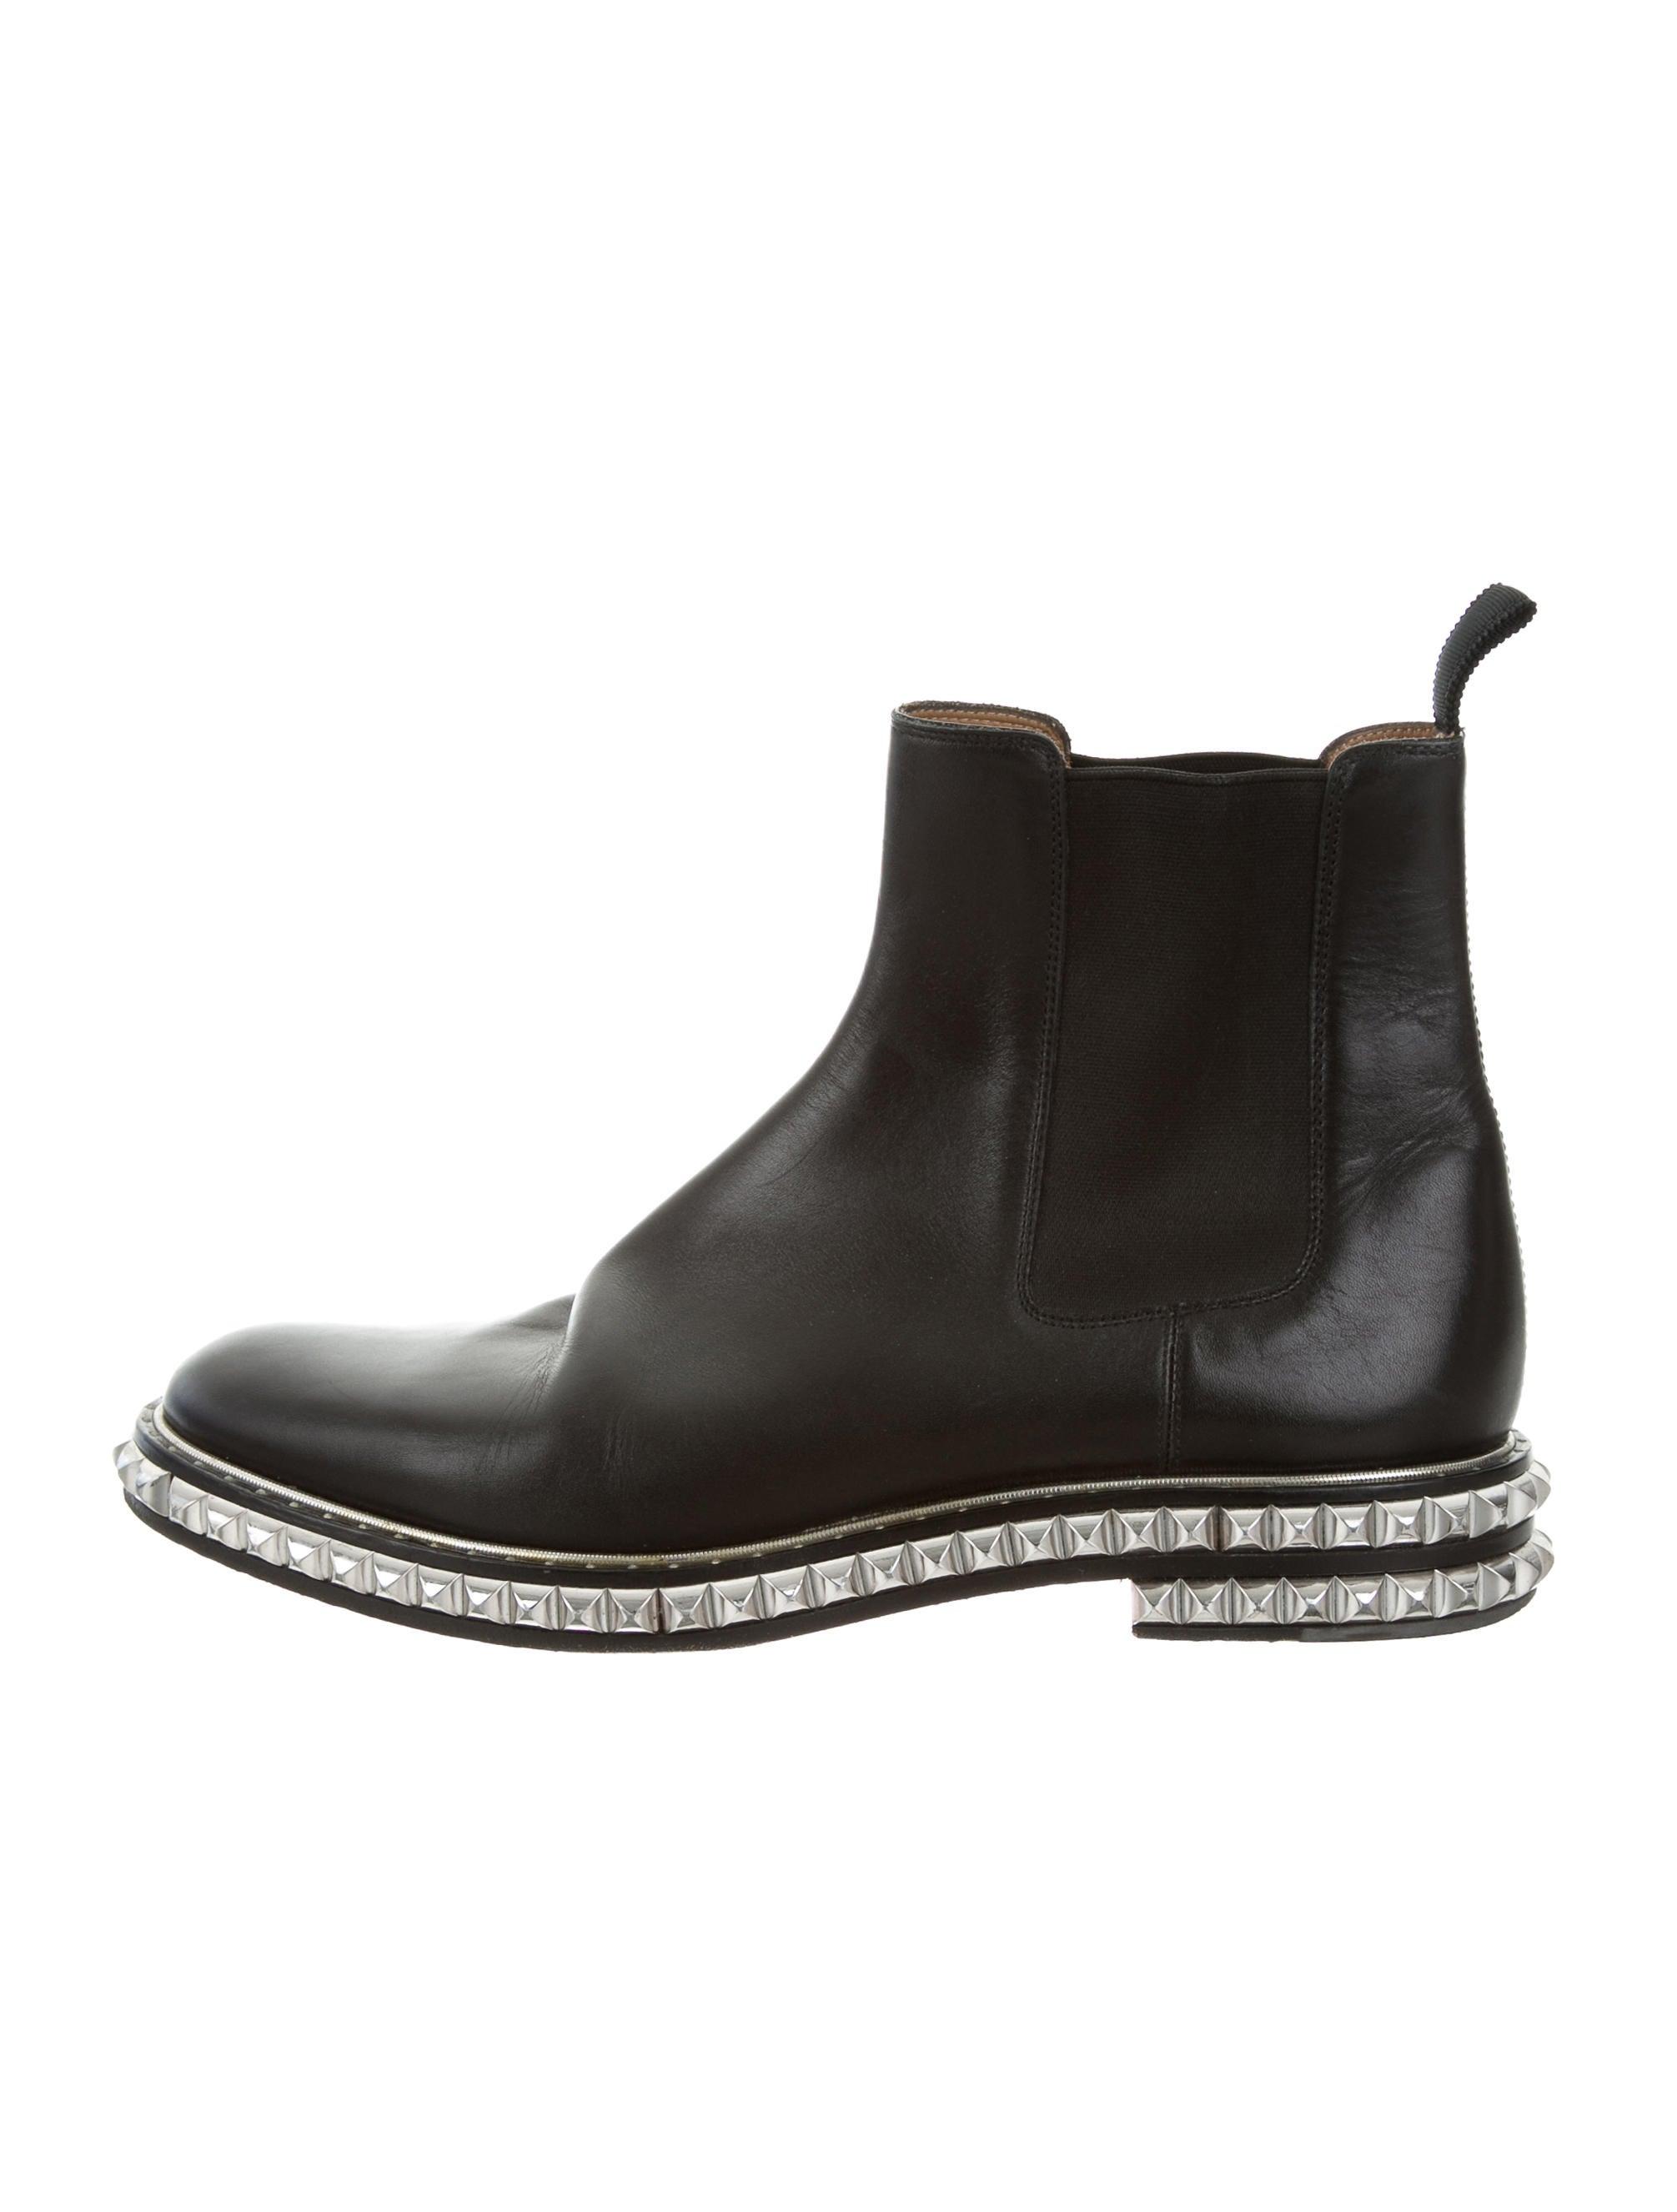 christian louboutin flat chelsea boots shoes